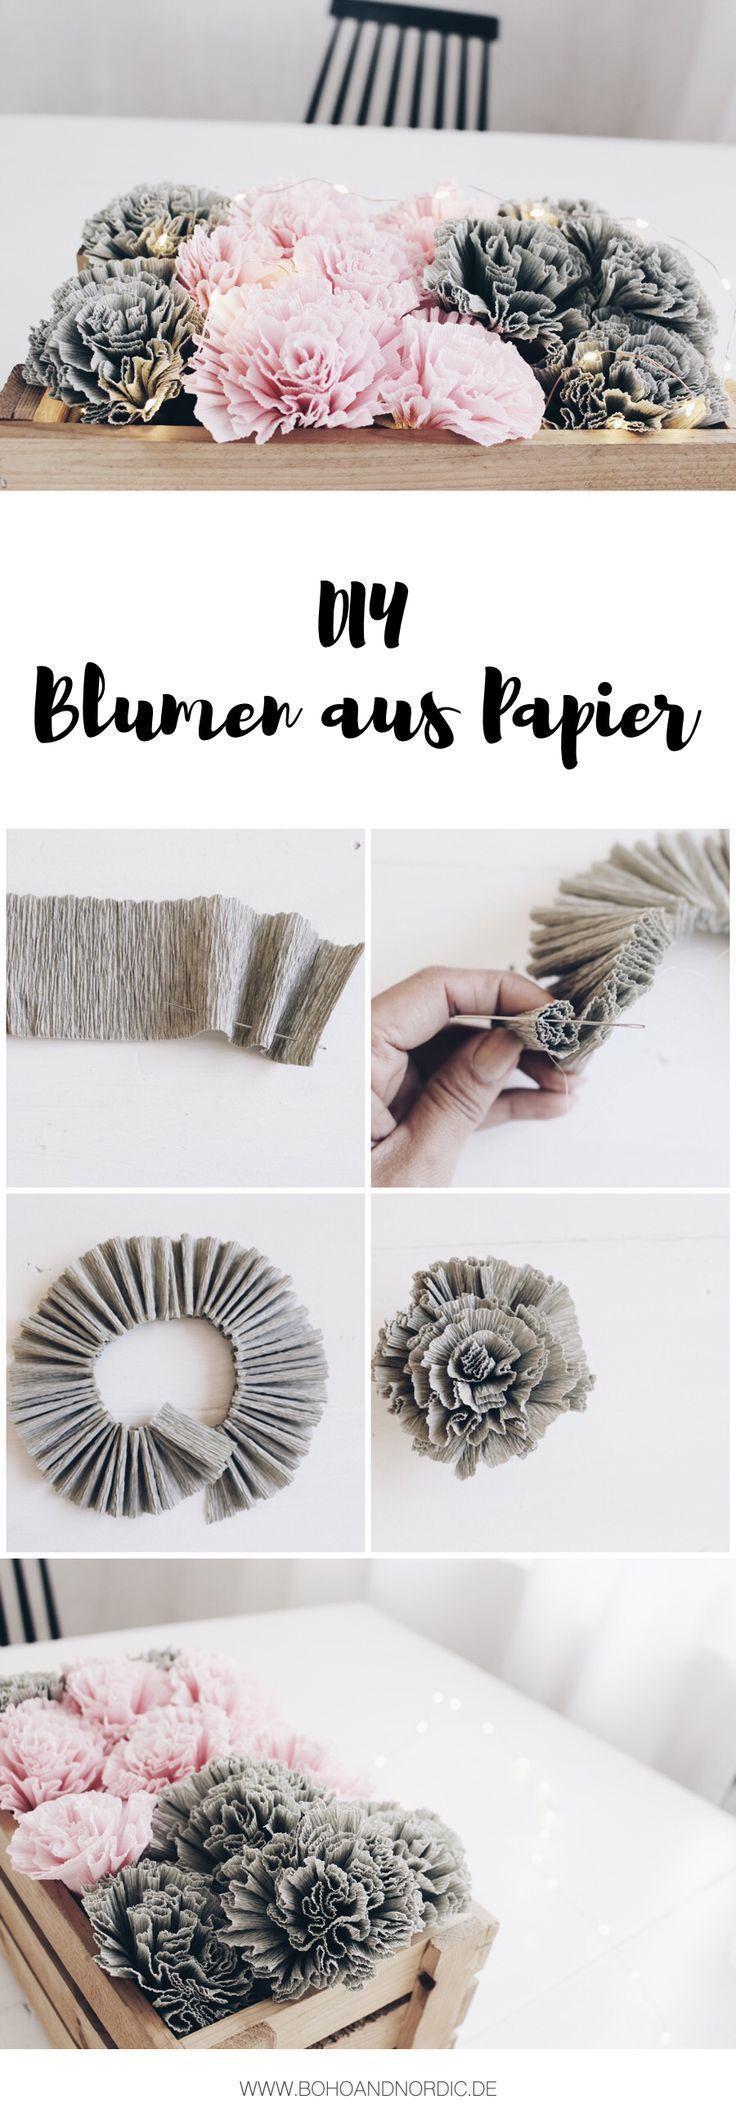 DIY Blumen aus Krepppapier   – Pflanzen ♡ Wohnklamotte